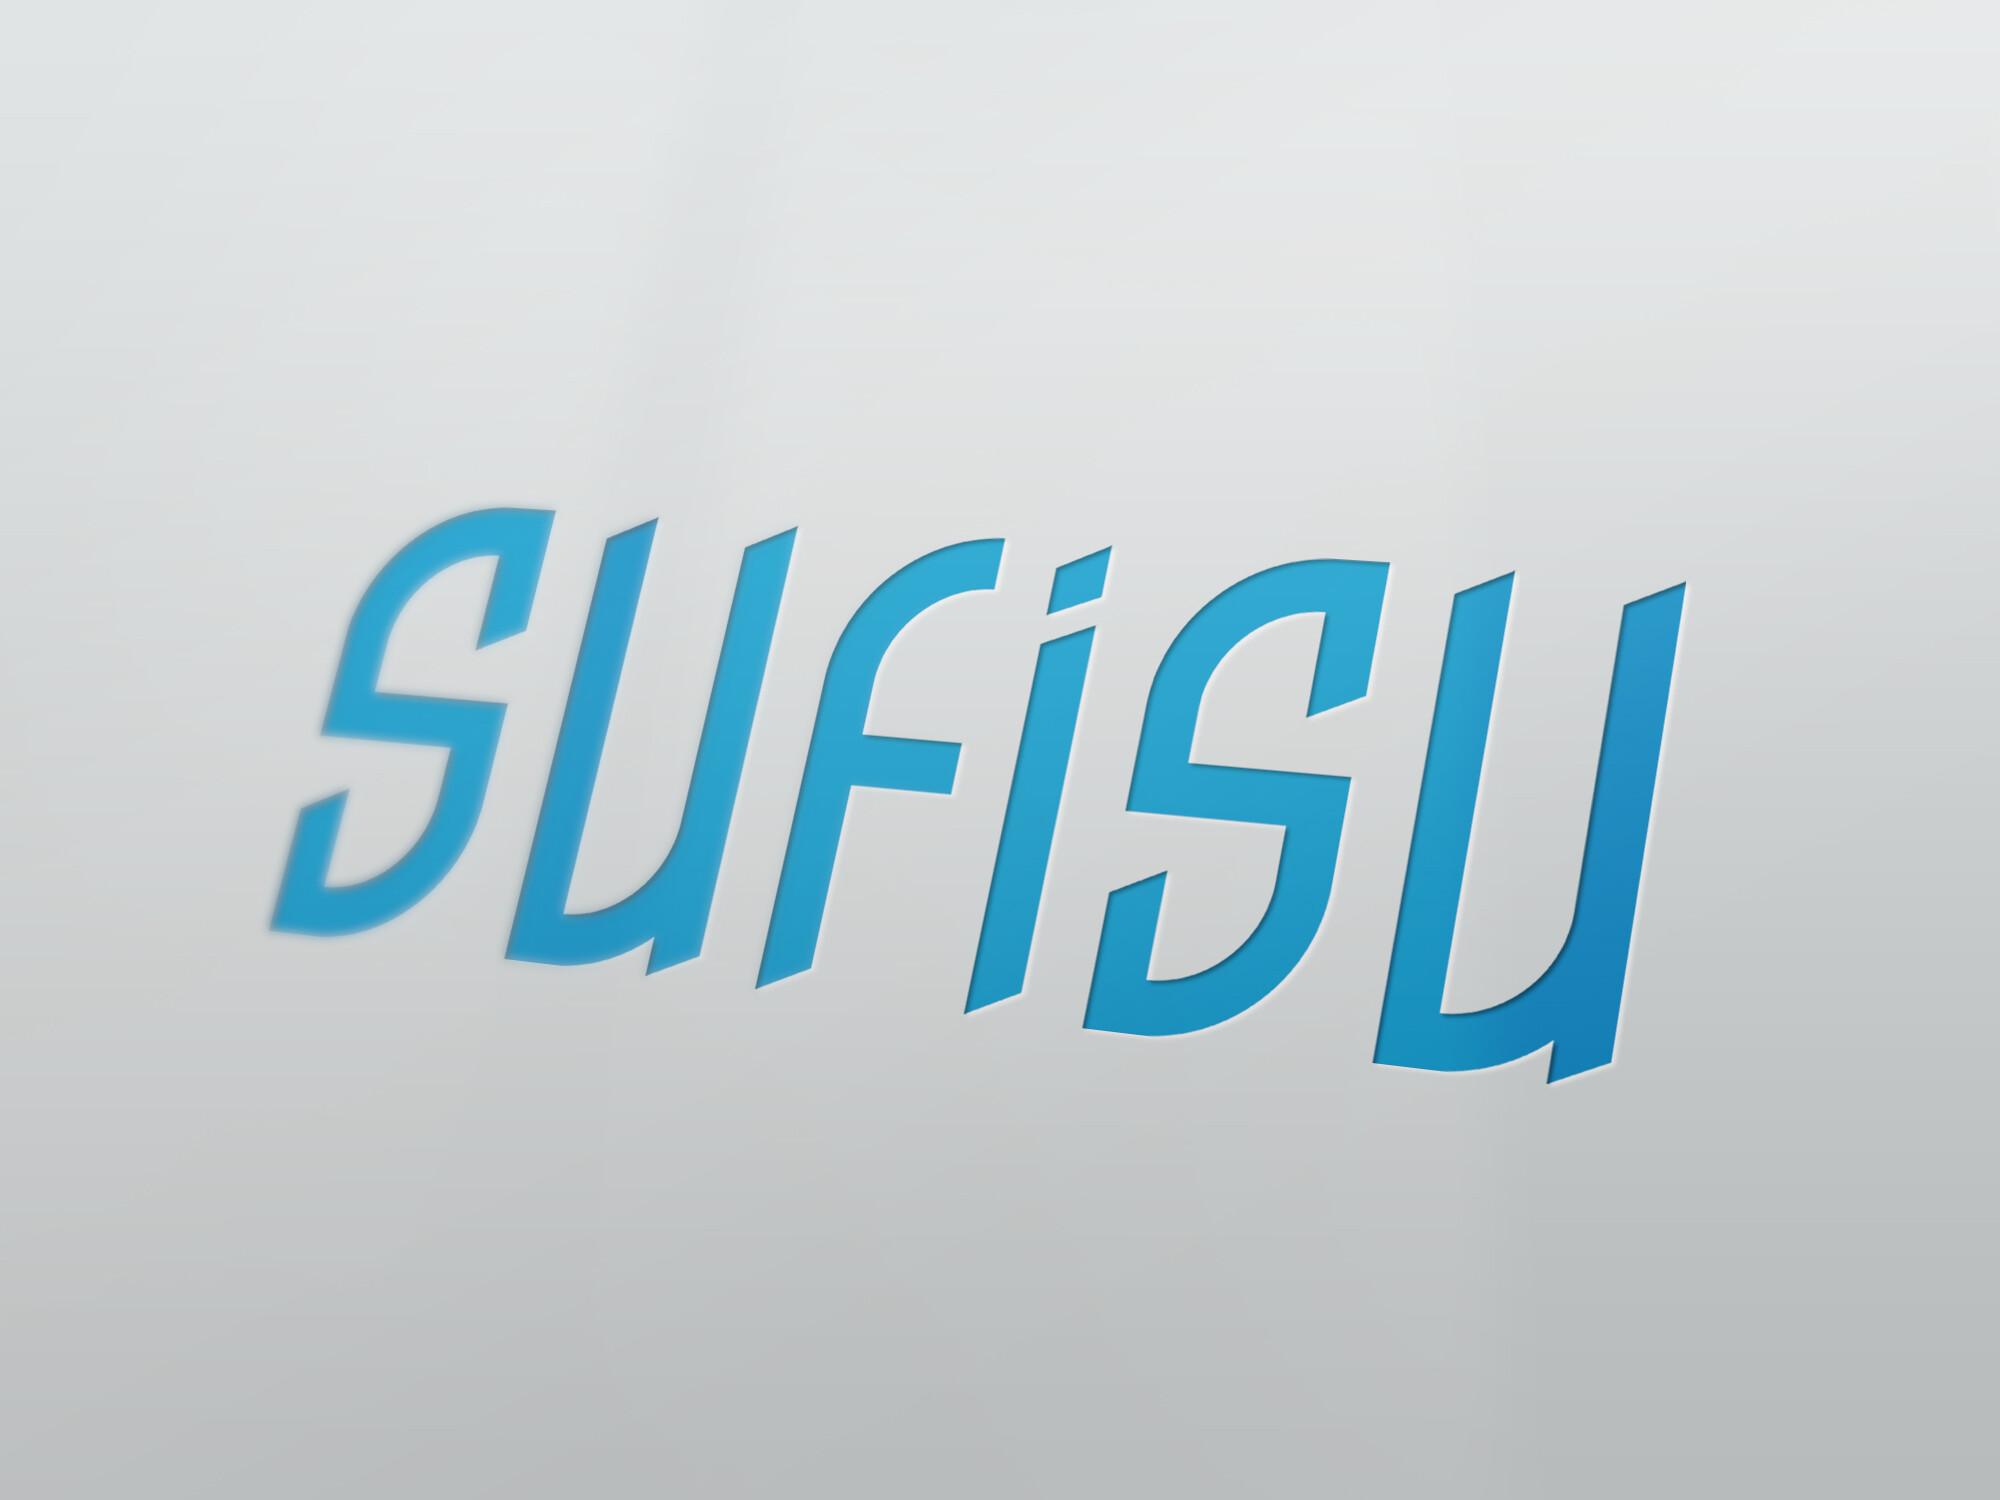 Sufisu logo